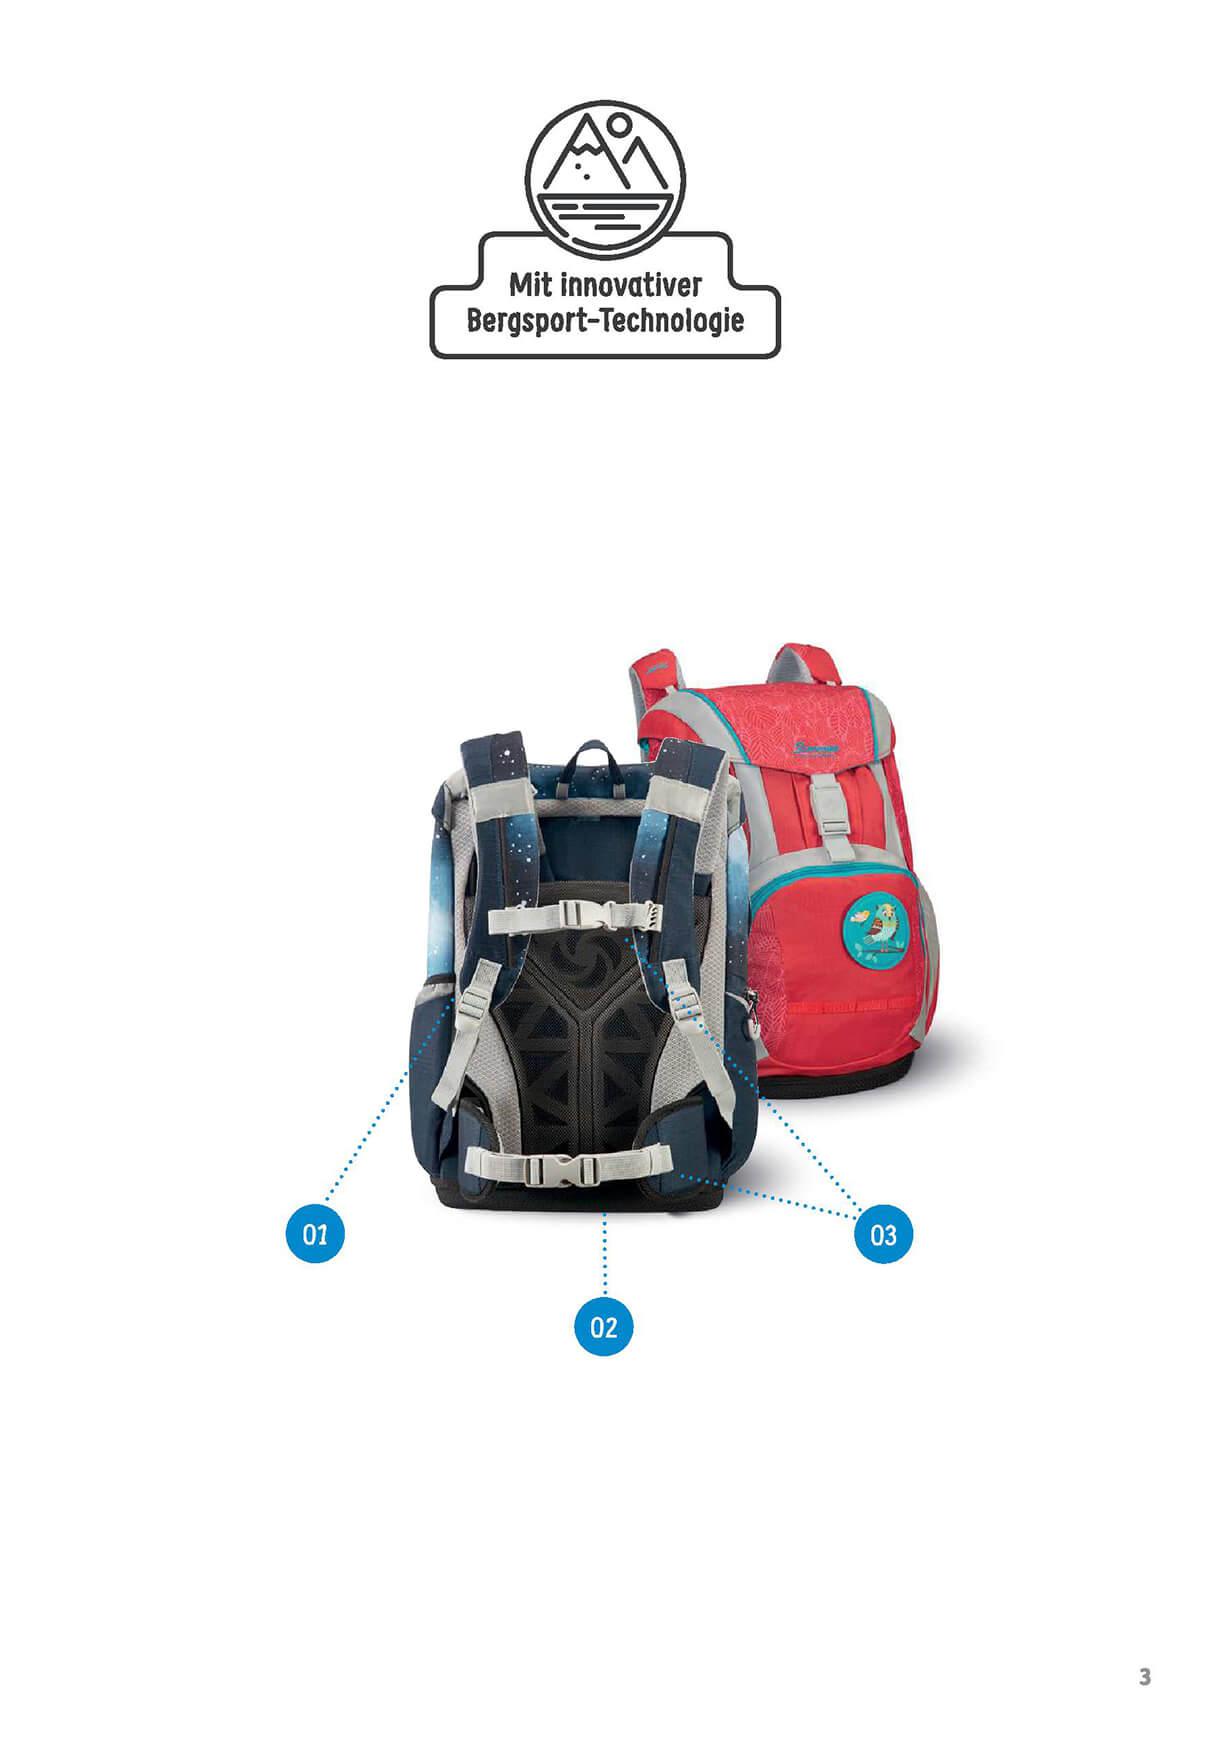 Mit innovativer Bergsport-Technologie